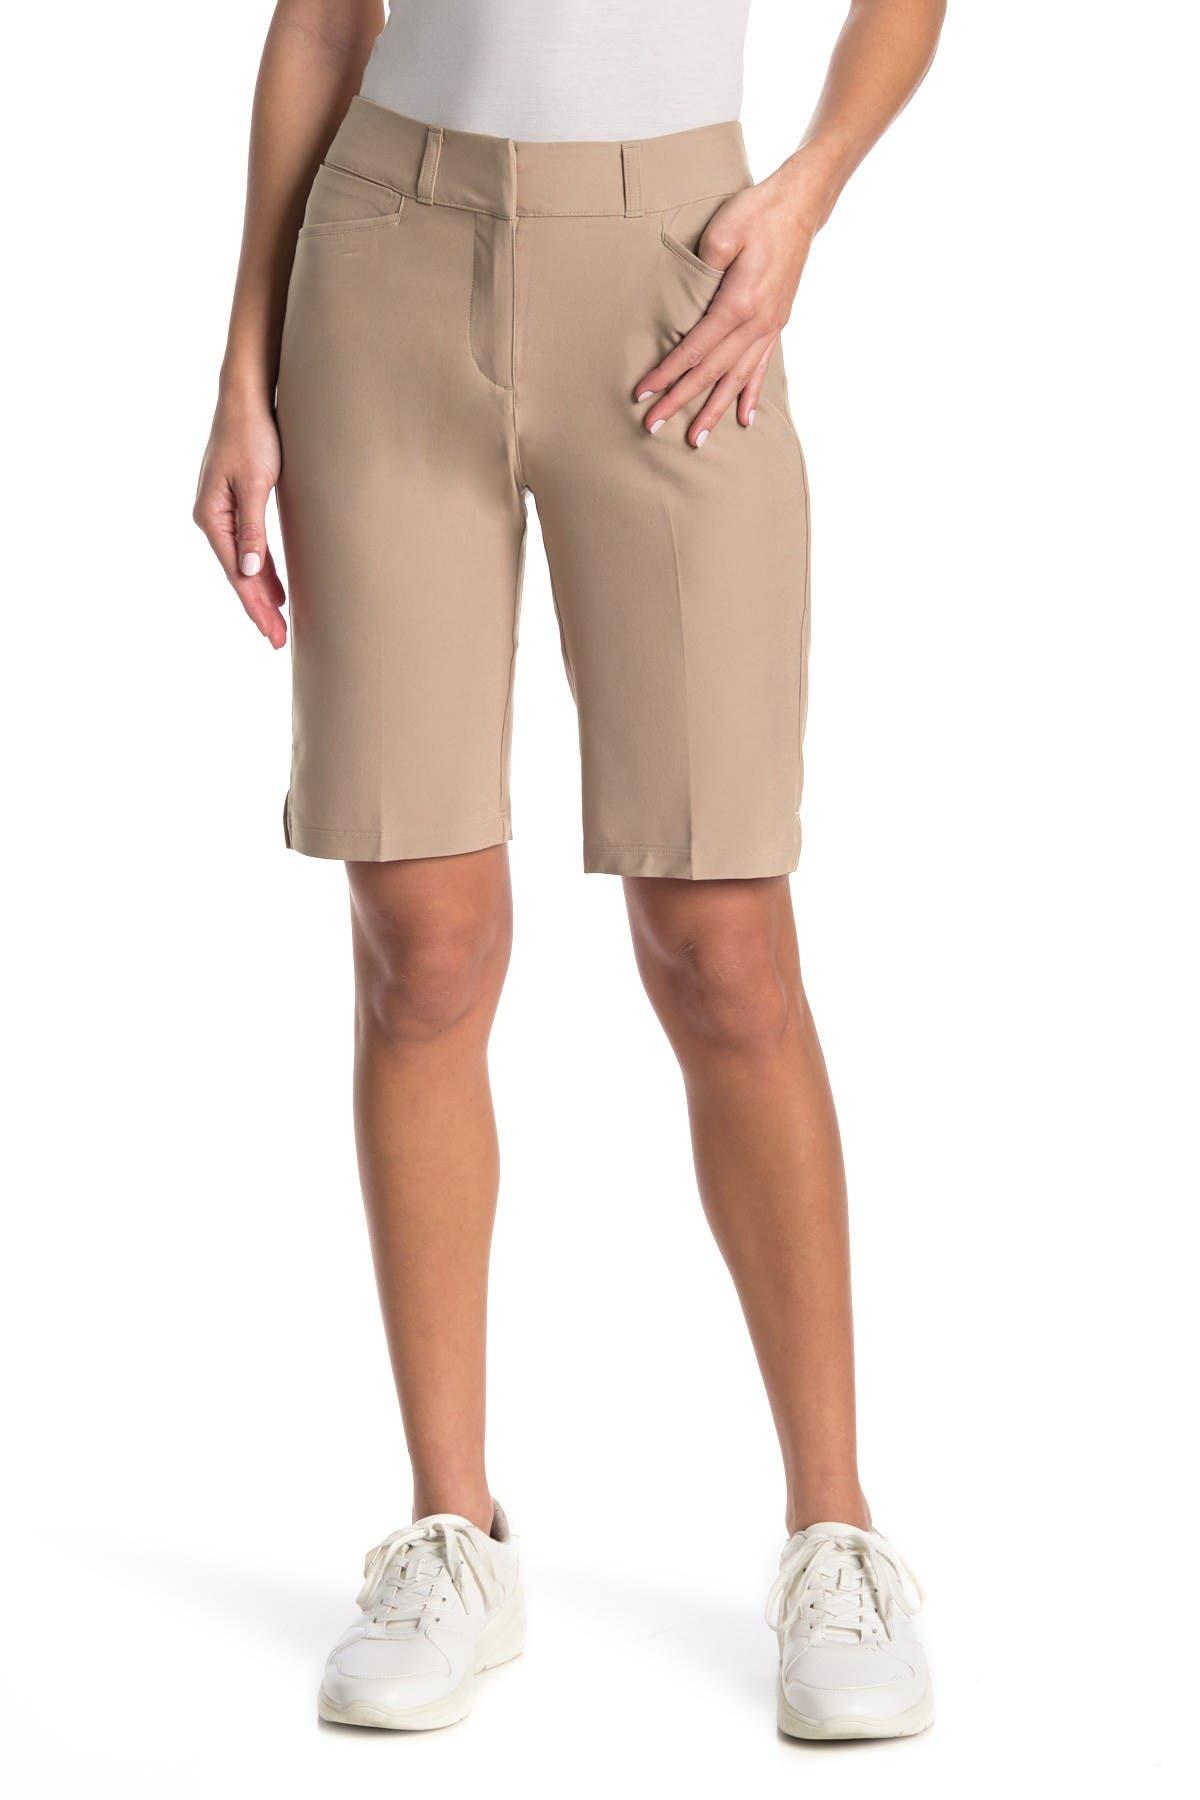 Image of Adidas Golf Ultimate Club Bermuda Shorts